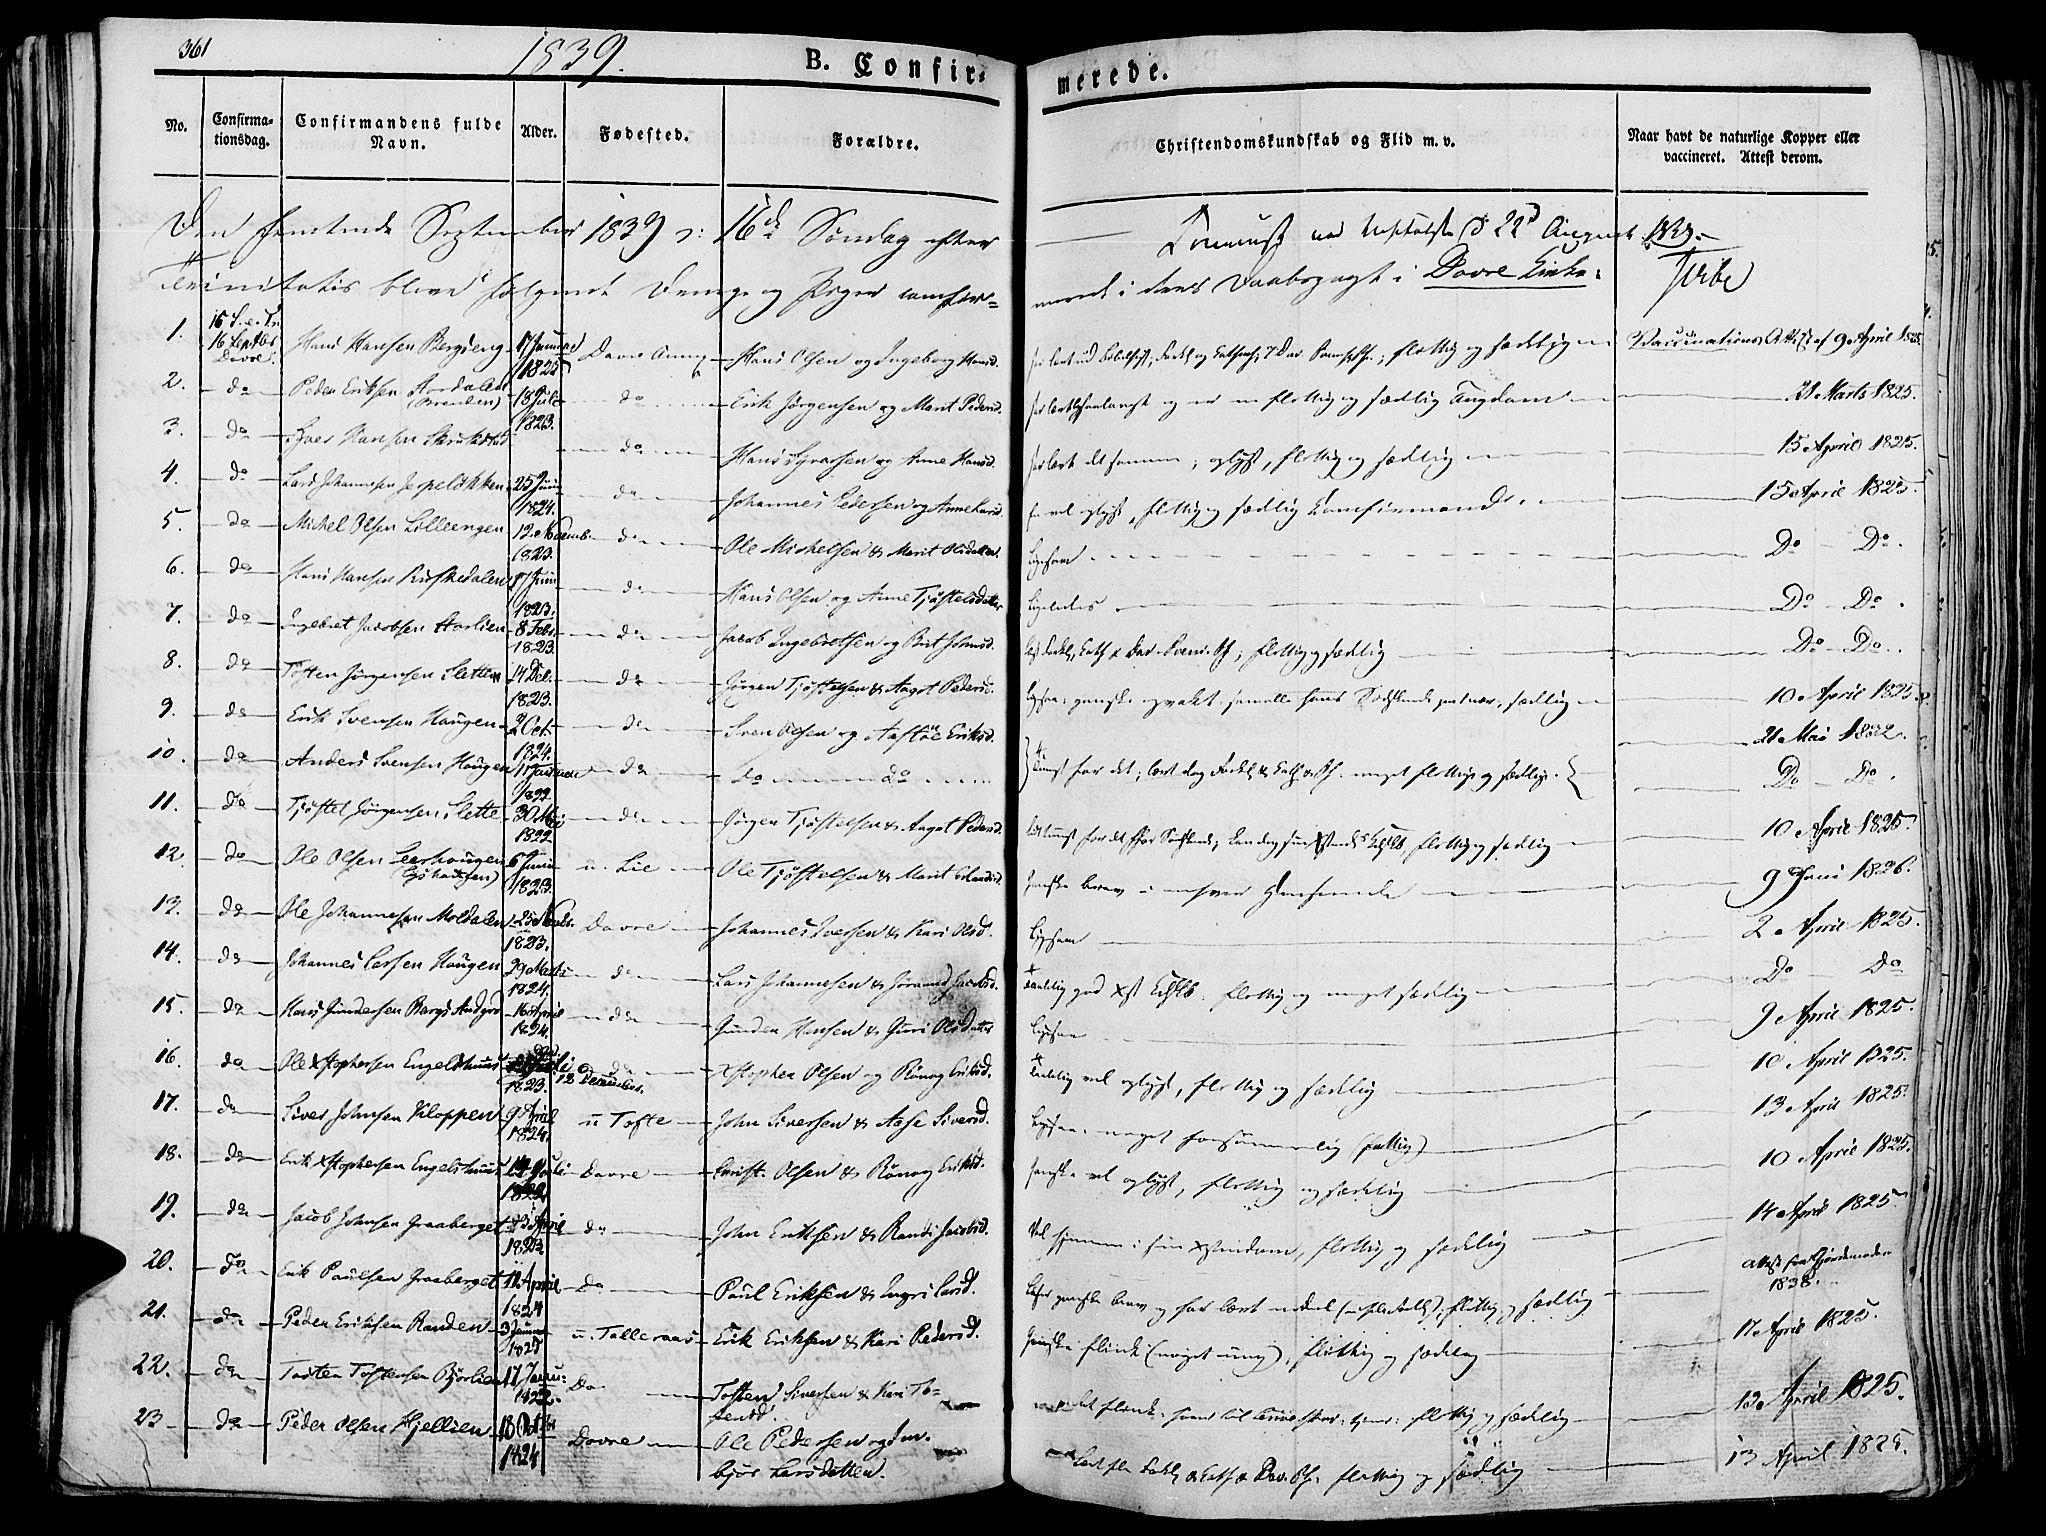 SAH, Lesja prestekontor, Ministerialbok nr. 5, 1830-1842, s. 361